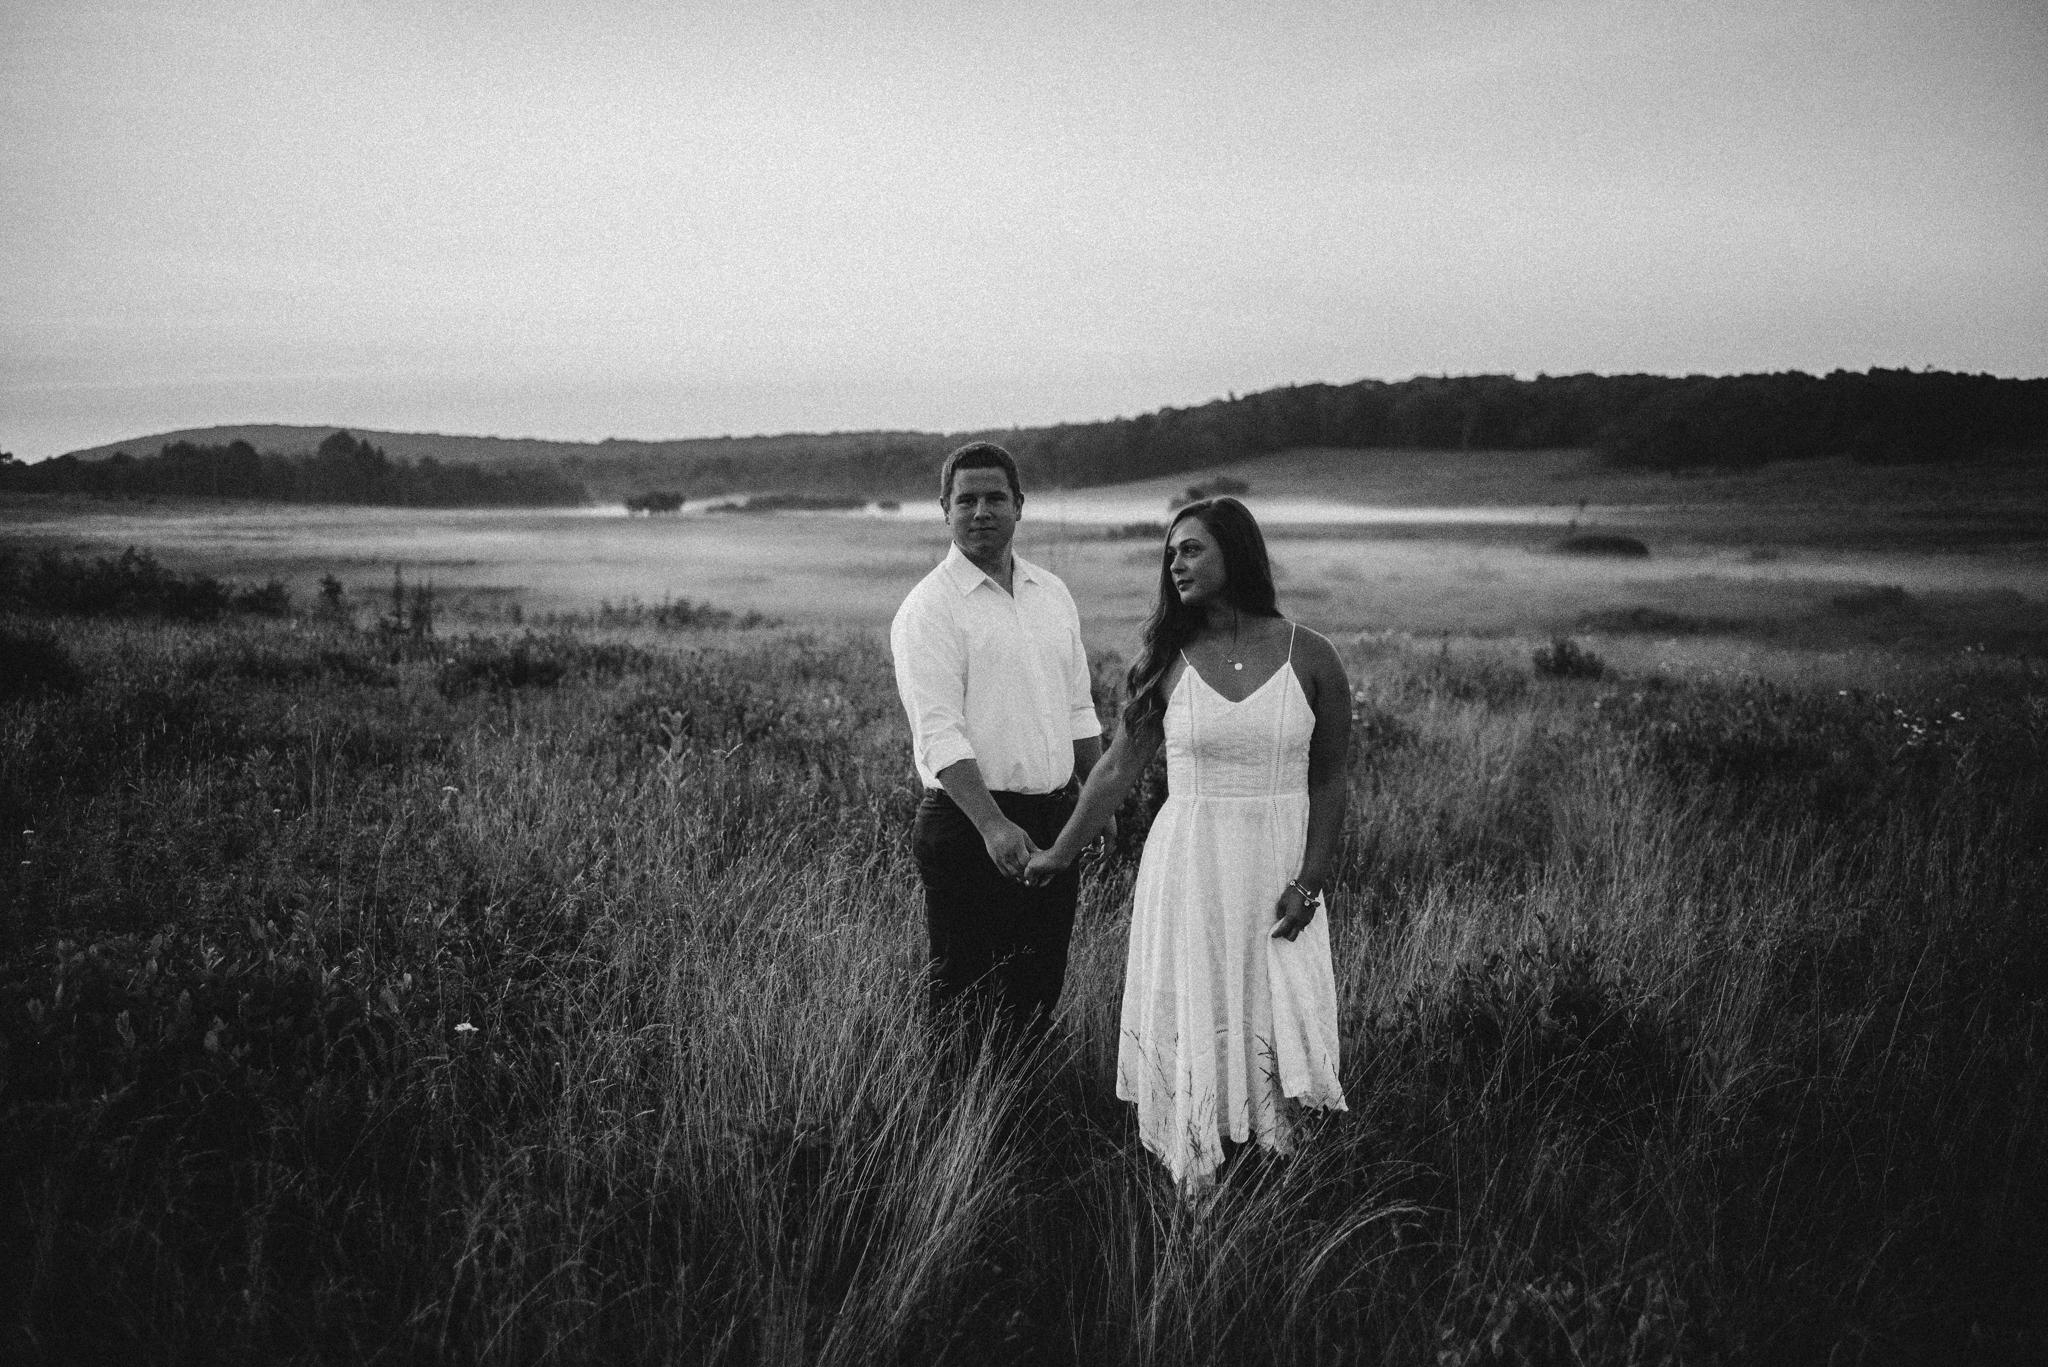 Erin and Matt - Shenandoah National Park Adventurous Sunrise Engagement Couple Photos - White Sails Creative_7.JPG